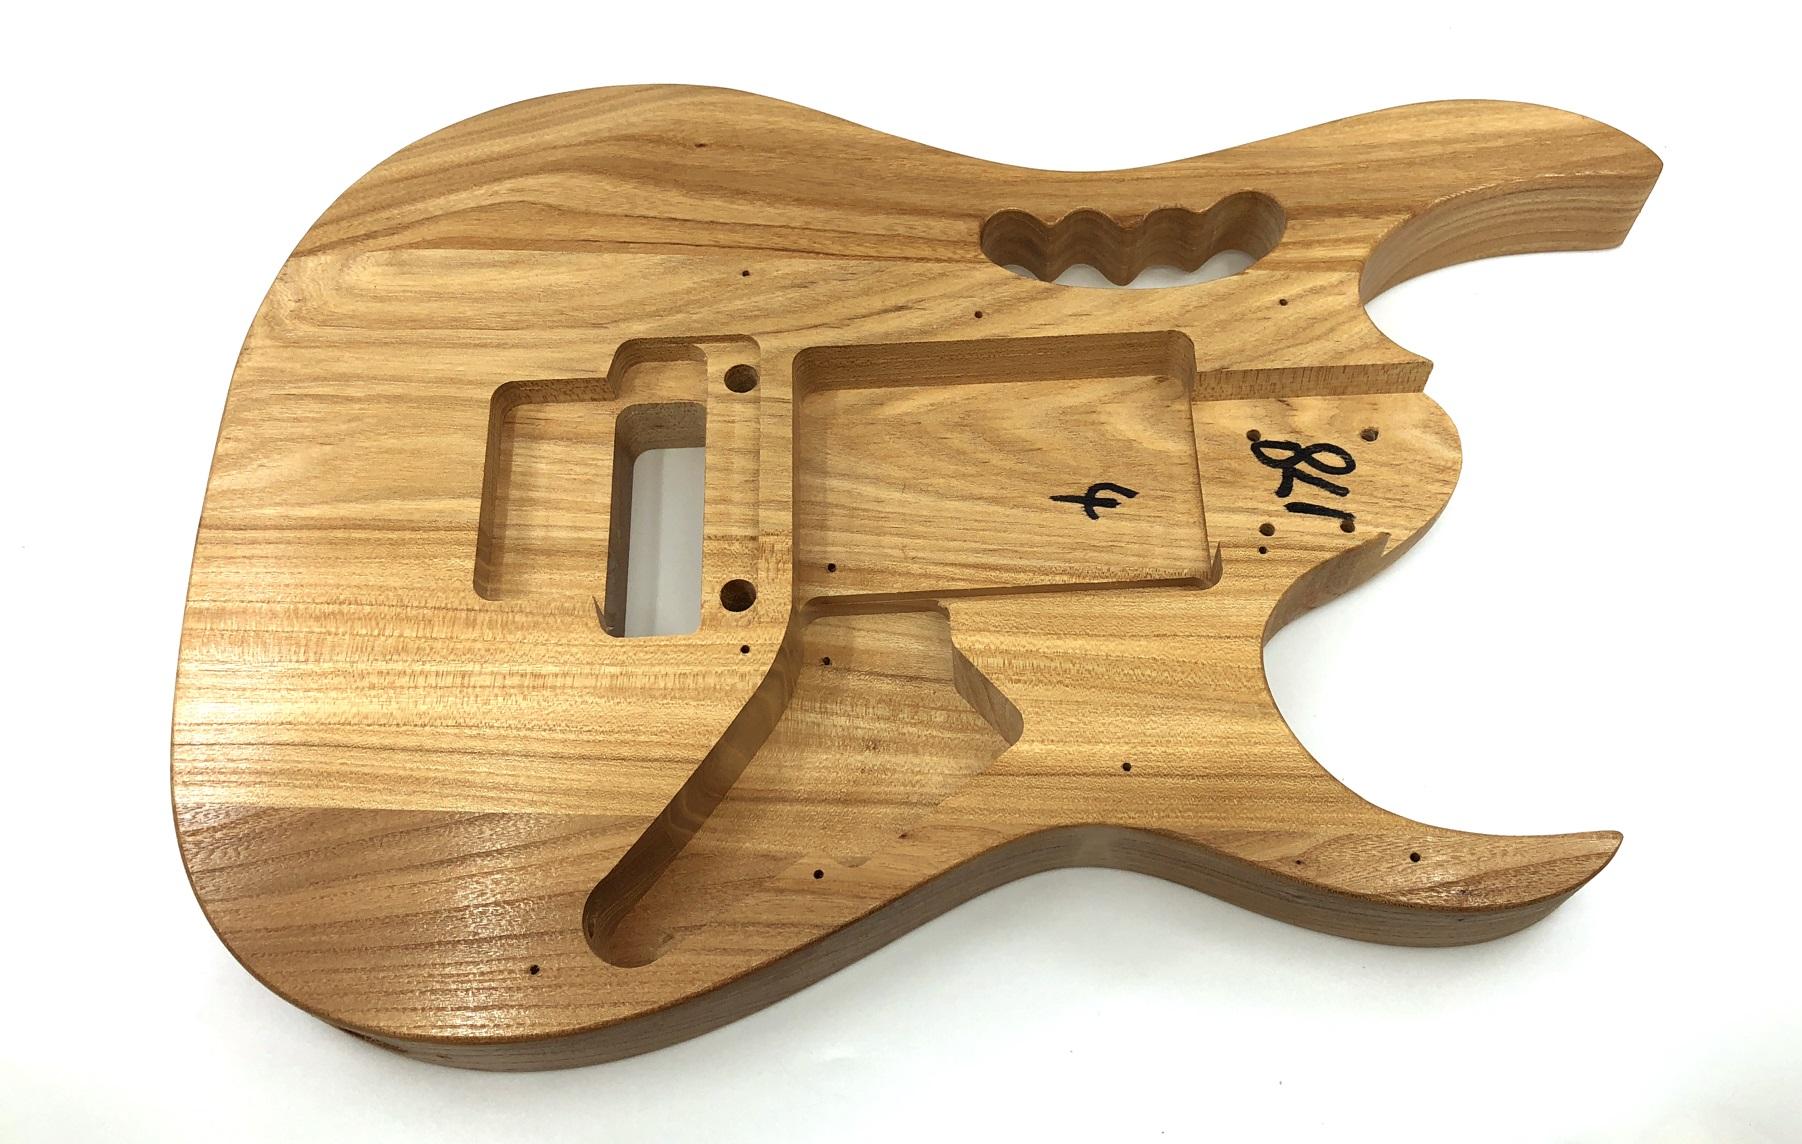 Solo JEK-7 DIY 7 String Electric Guitar Kit With Vine Inlay /& Floyd Rose